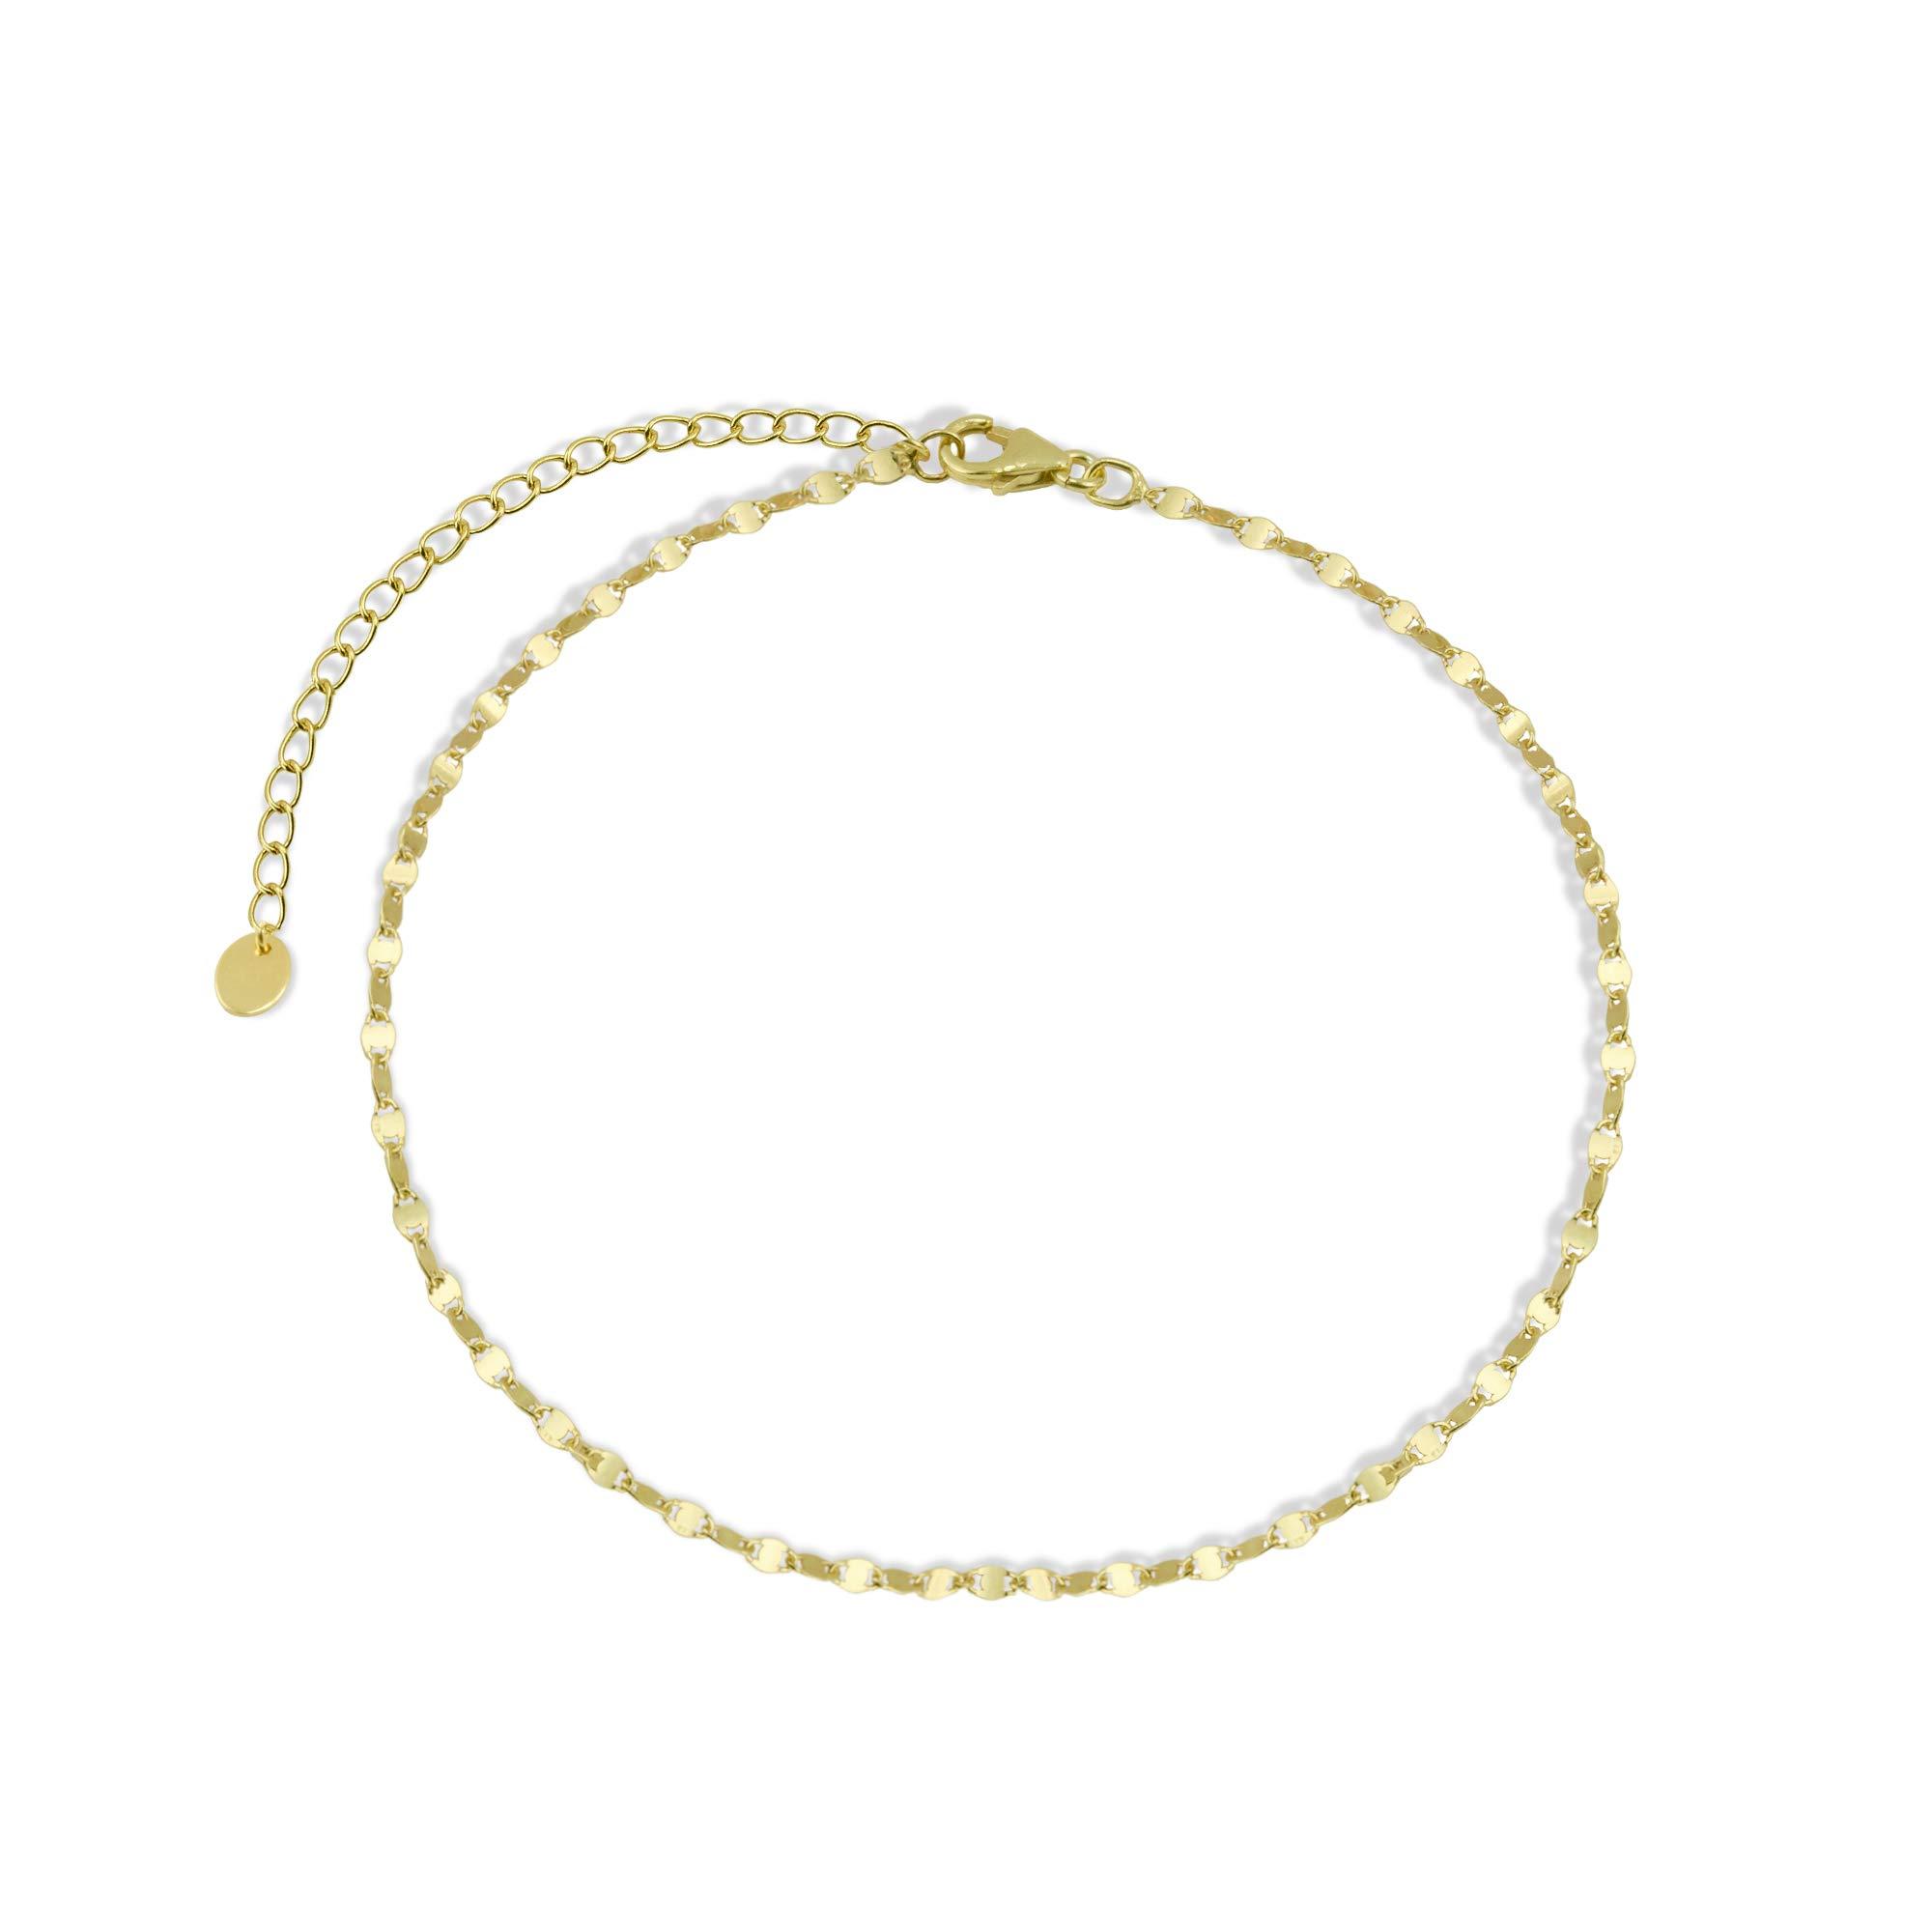 Argento Vivo Women's G Paillette Choker, Gold, One Size